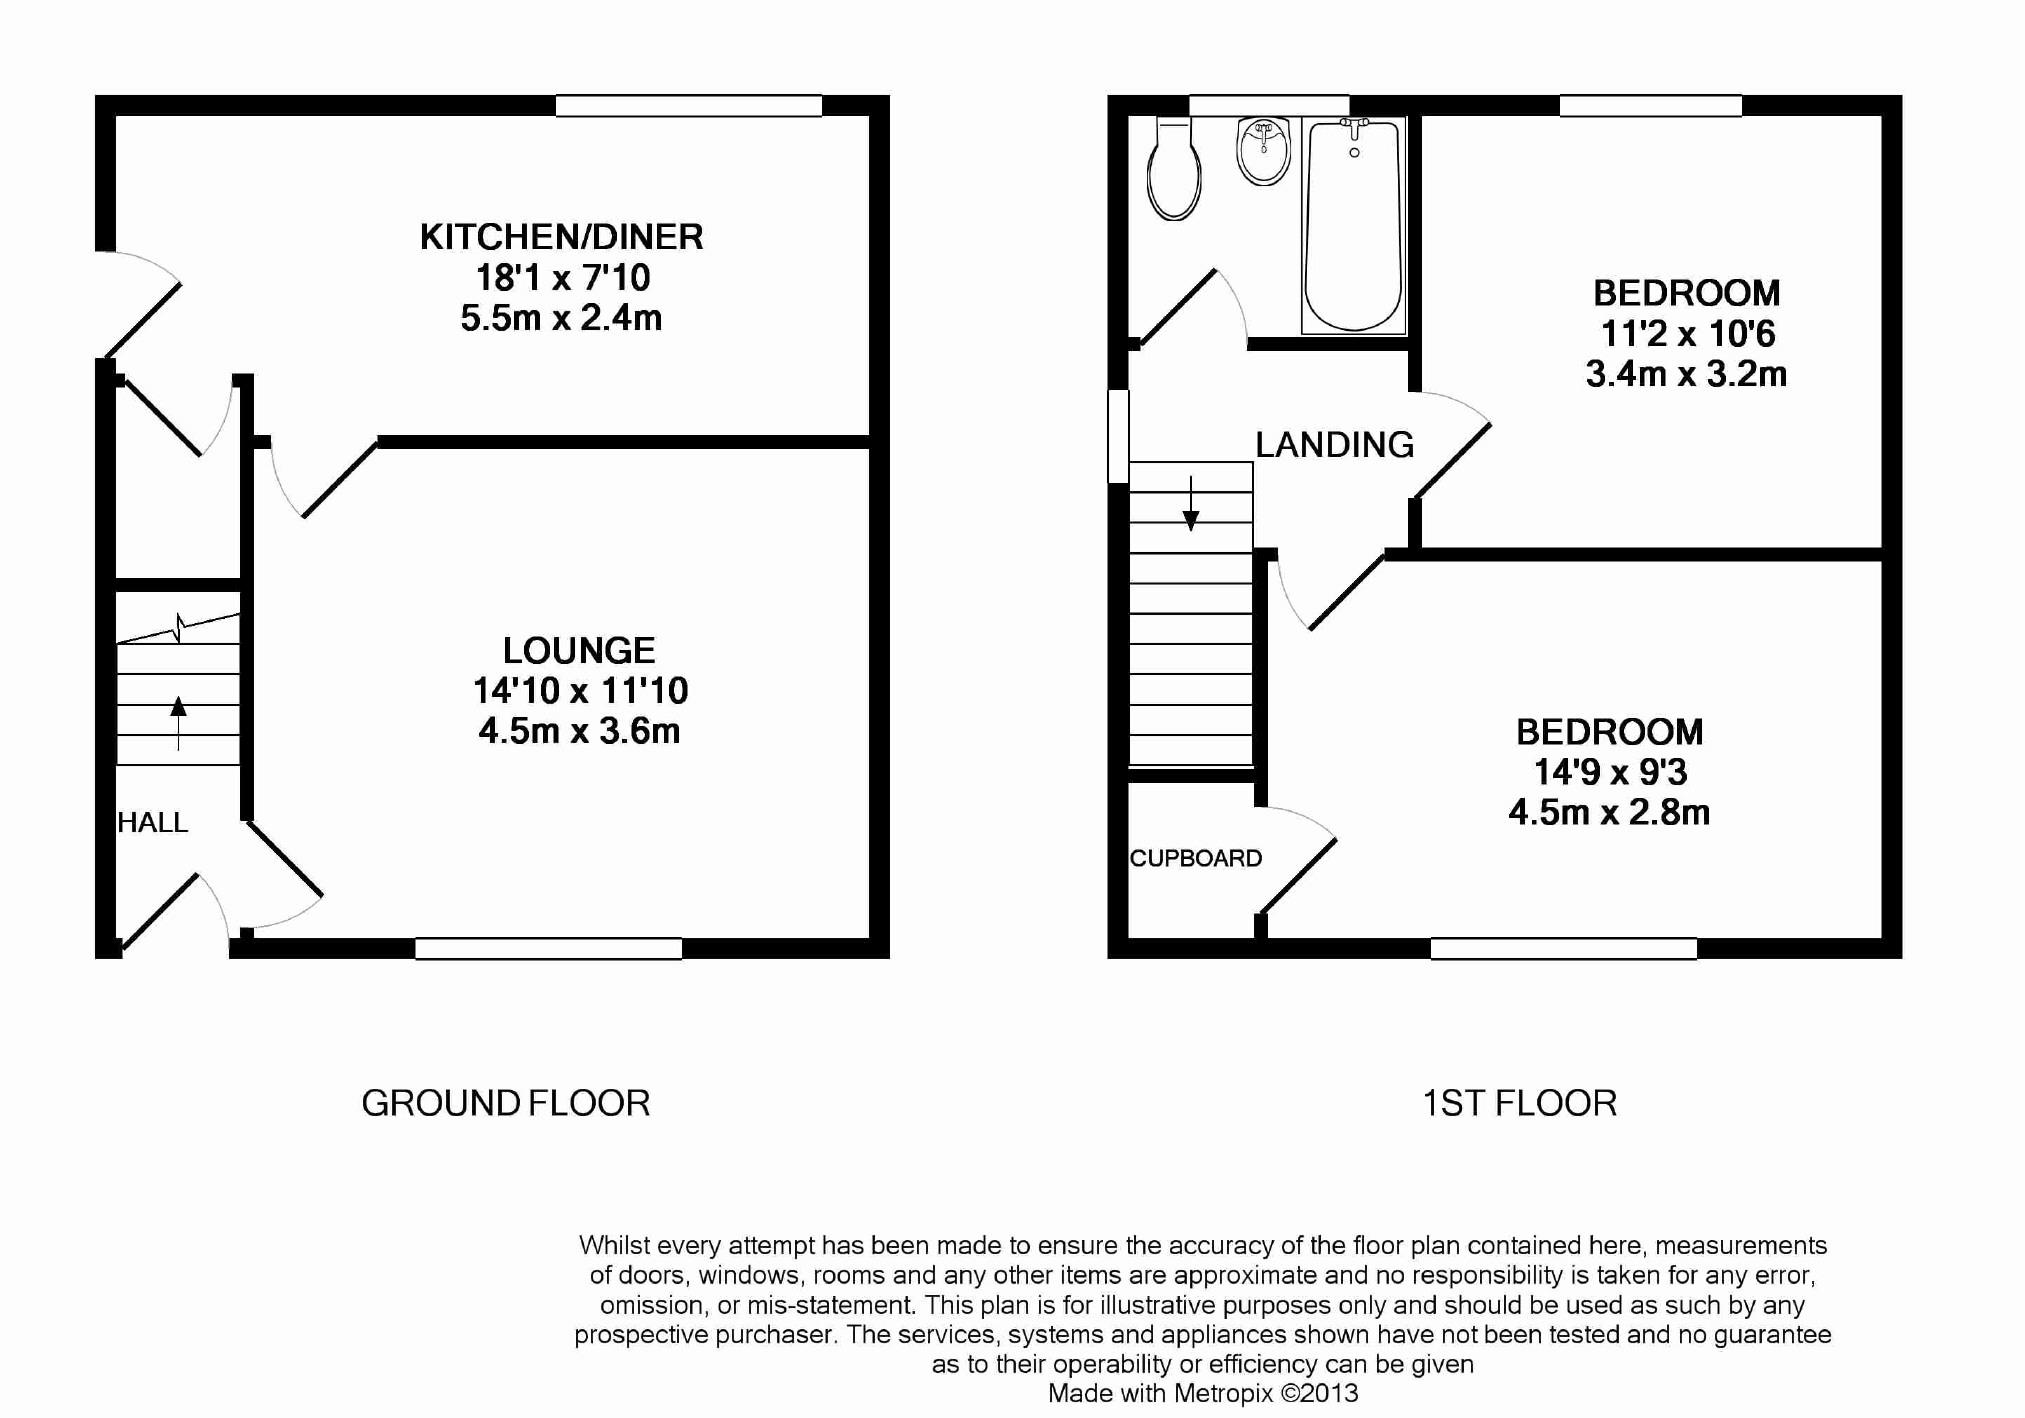 2 Bedroom Property For Sale In Nairn Close Crosland Moor